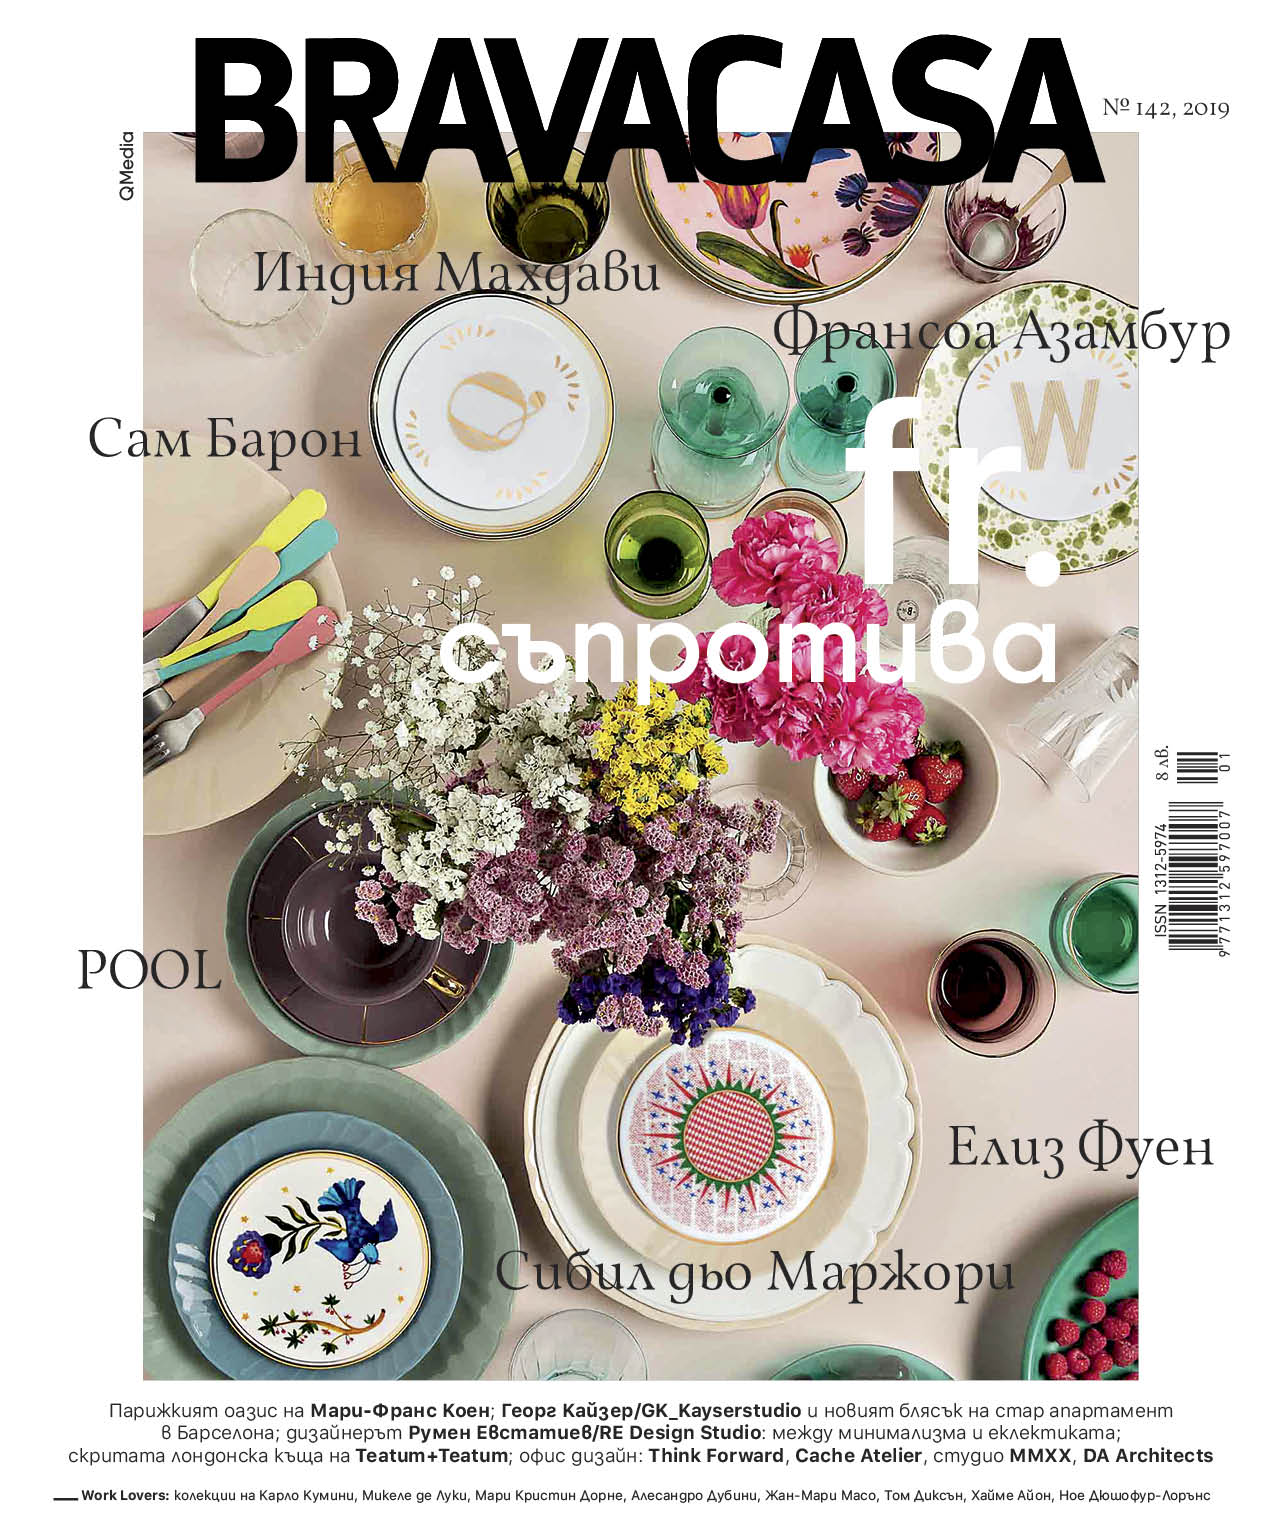 Bravacasa_Cover_142.jpg